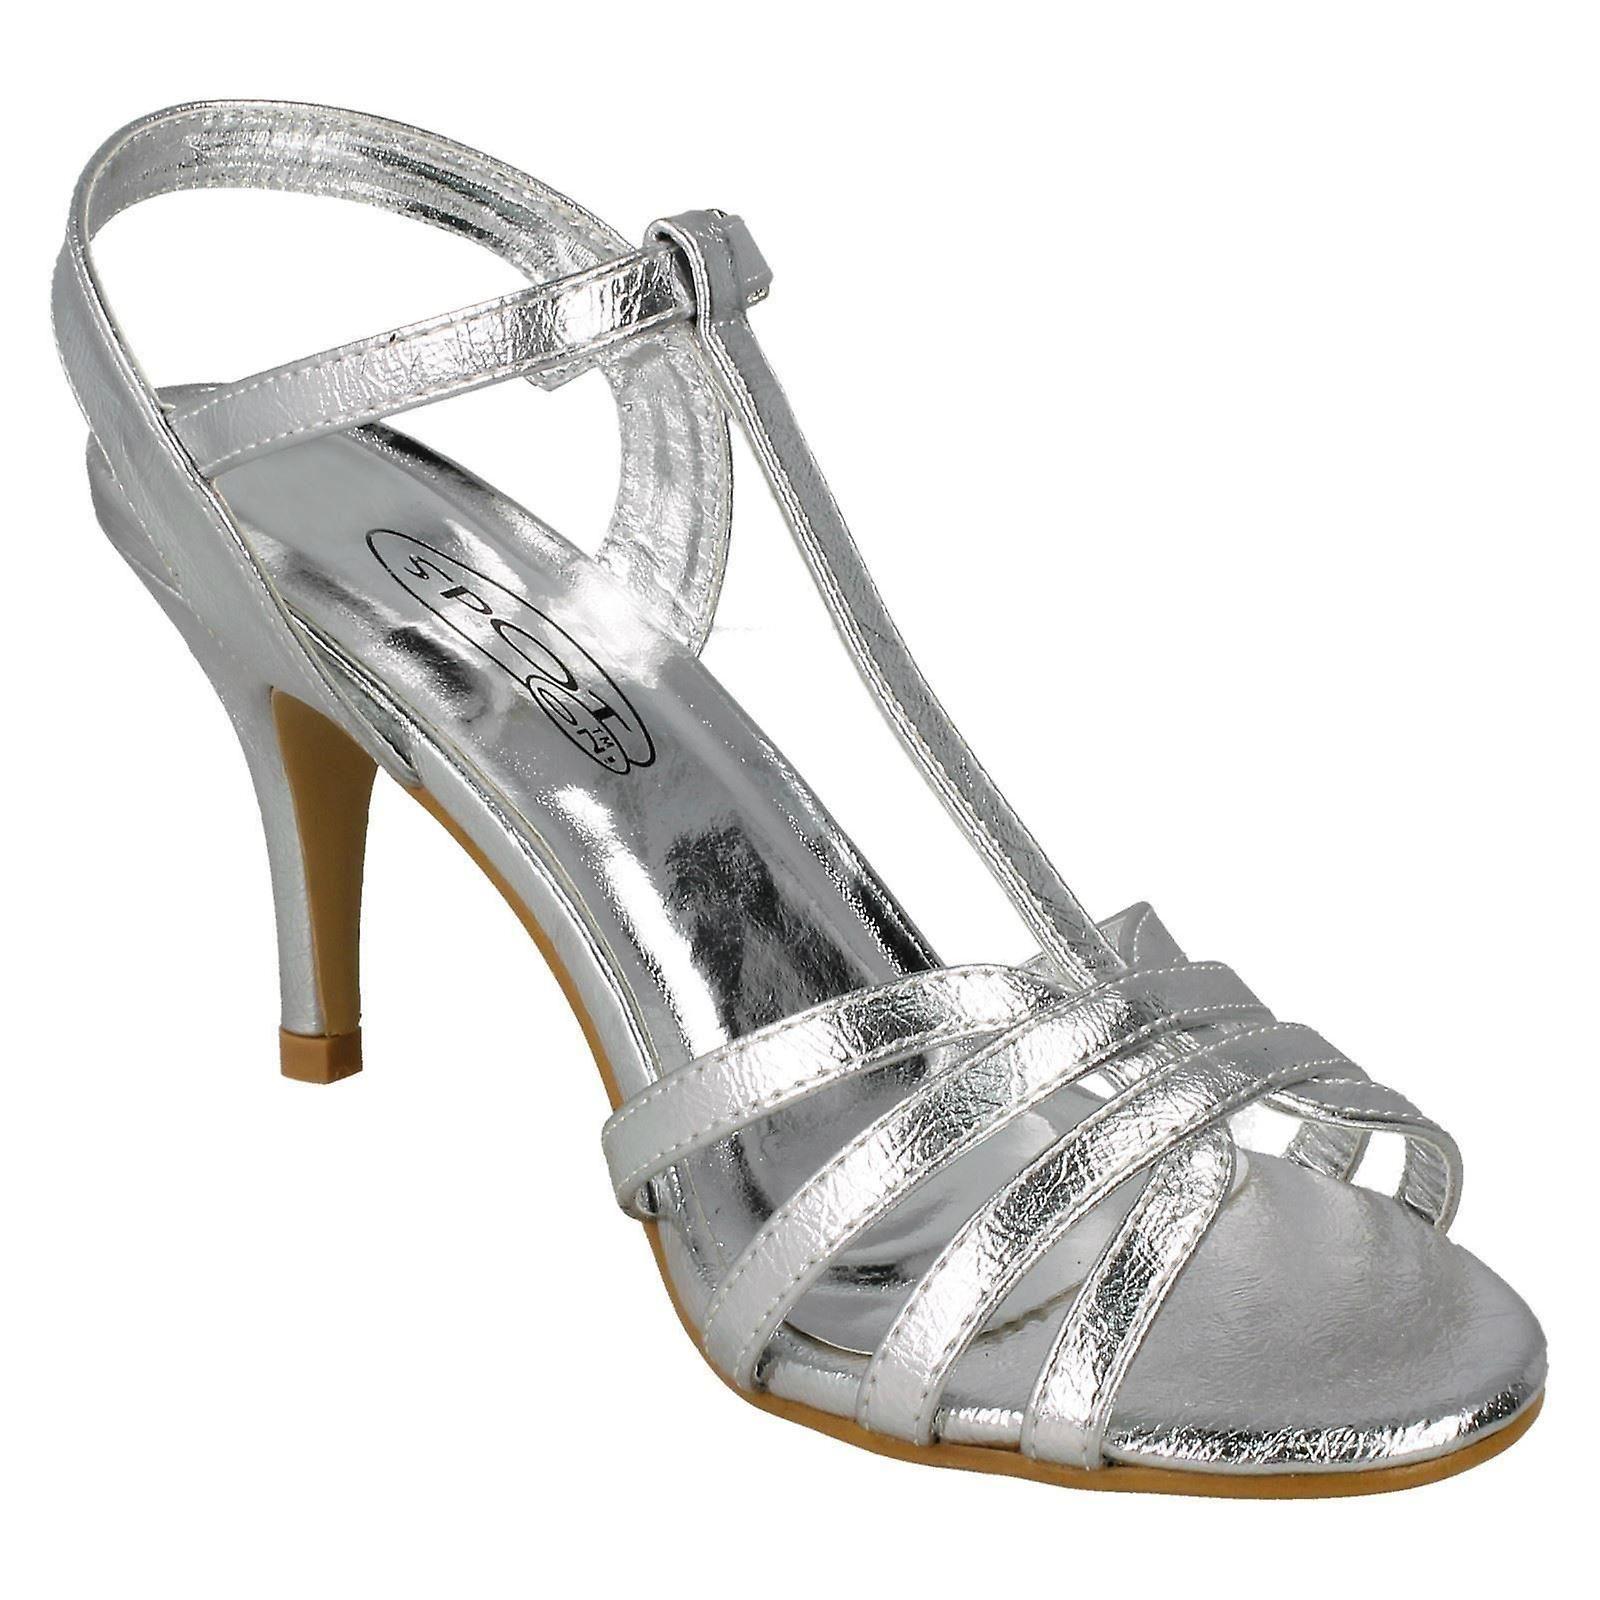 High Sandals UK 6 39 Spot Size Size 8 Ladies Metallic On Heel US Size EU Silver F10837 Foil Metallic 47EcvXqcZ